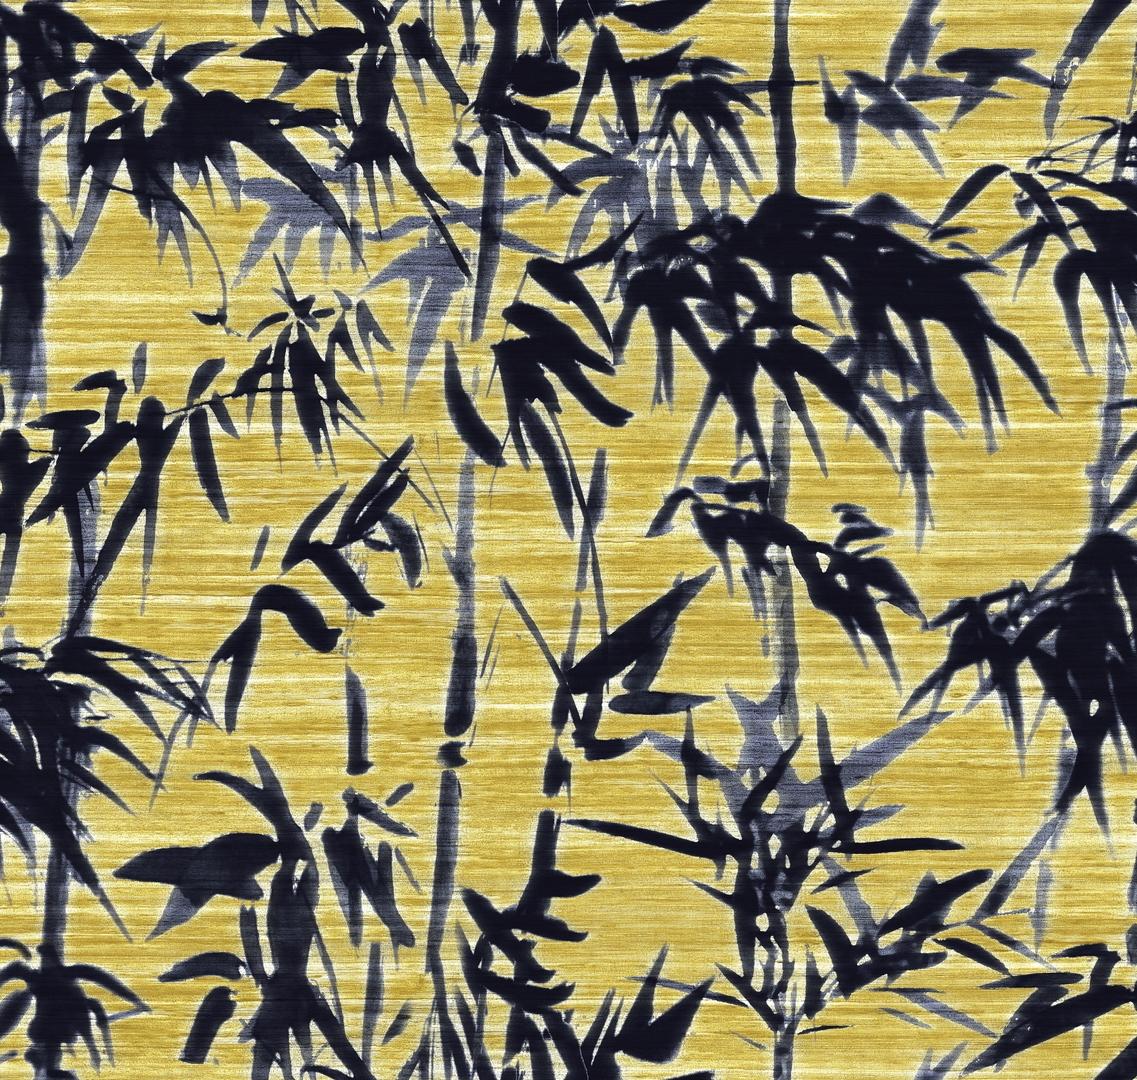 VP_854_01-papier-peint-bambou-elitis (2)